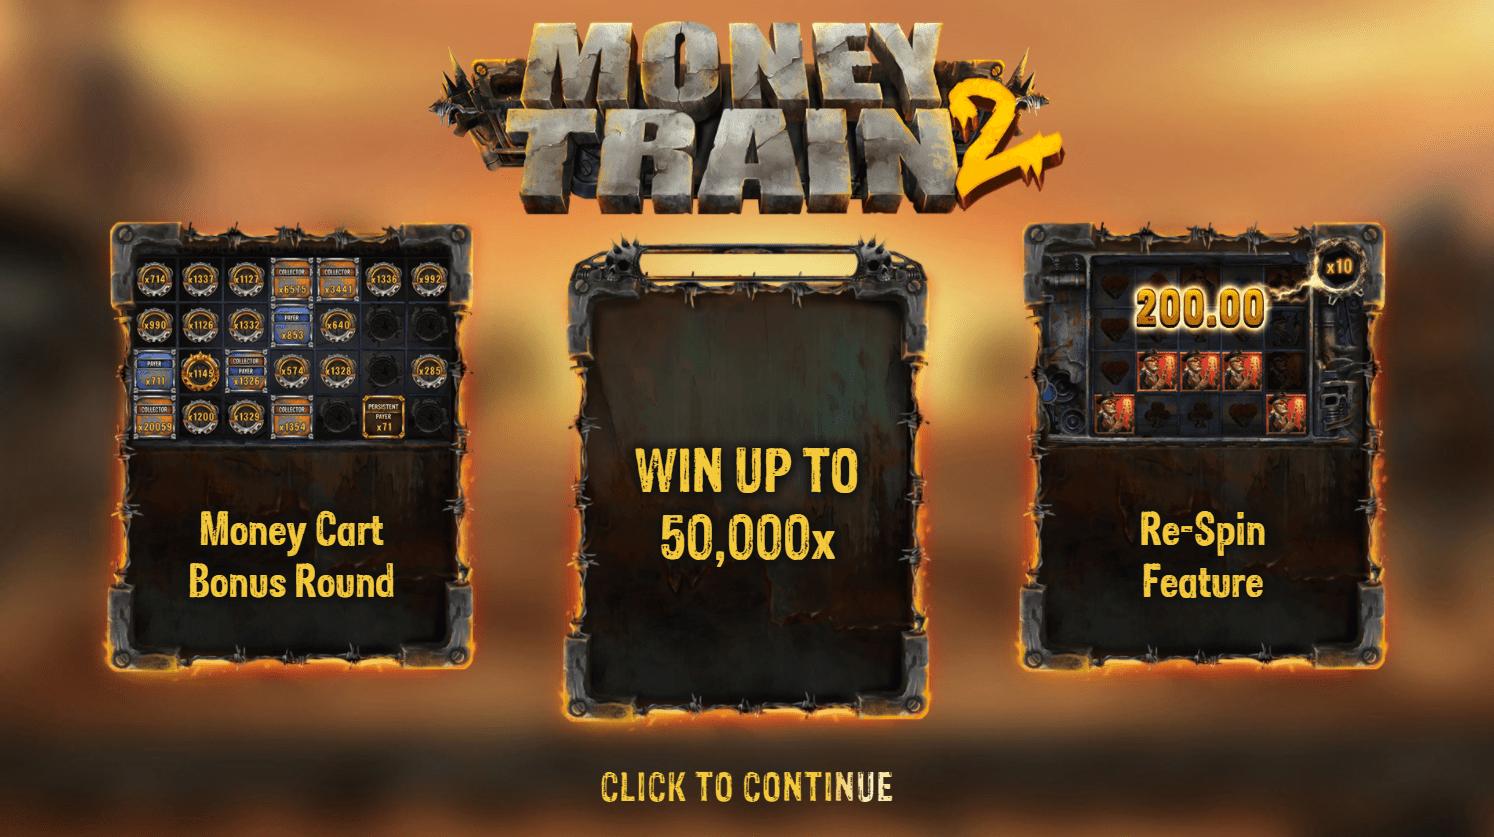 Moneytrain feature